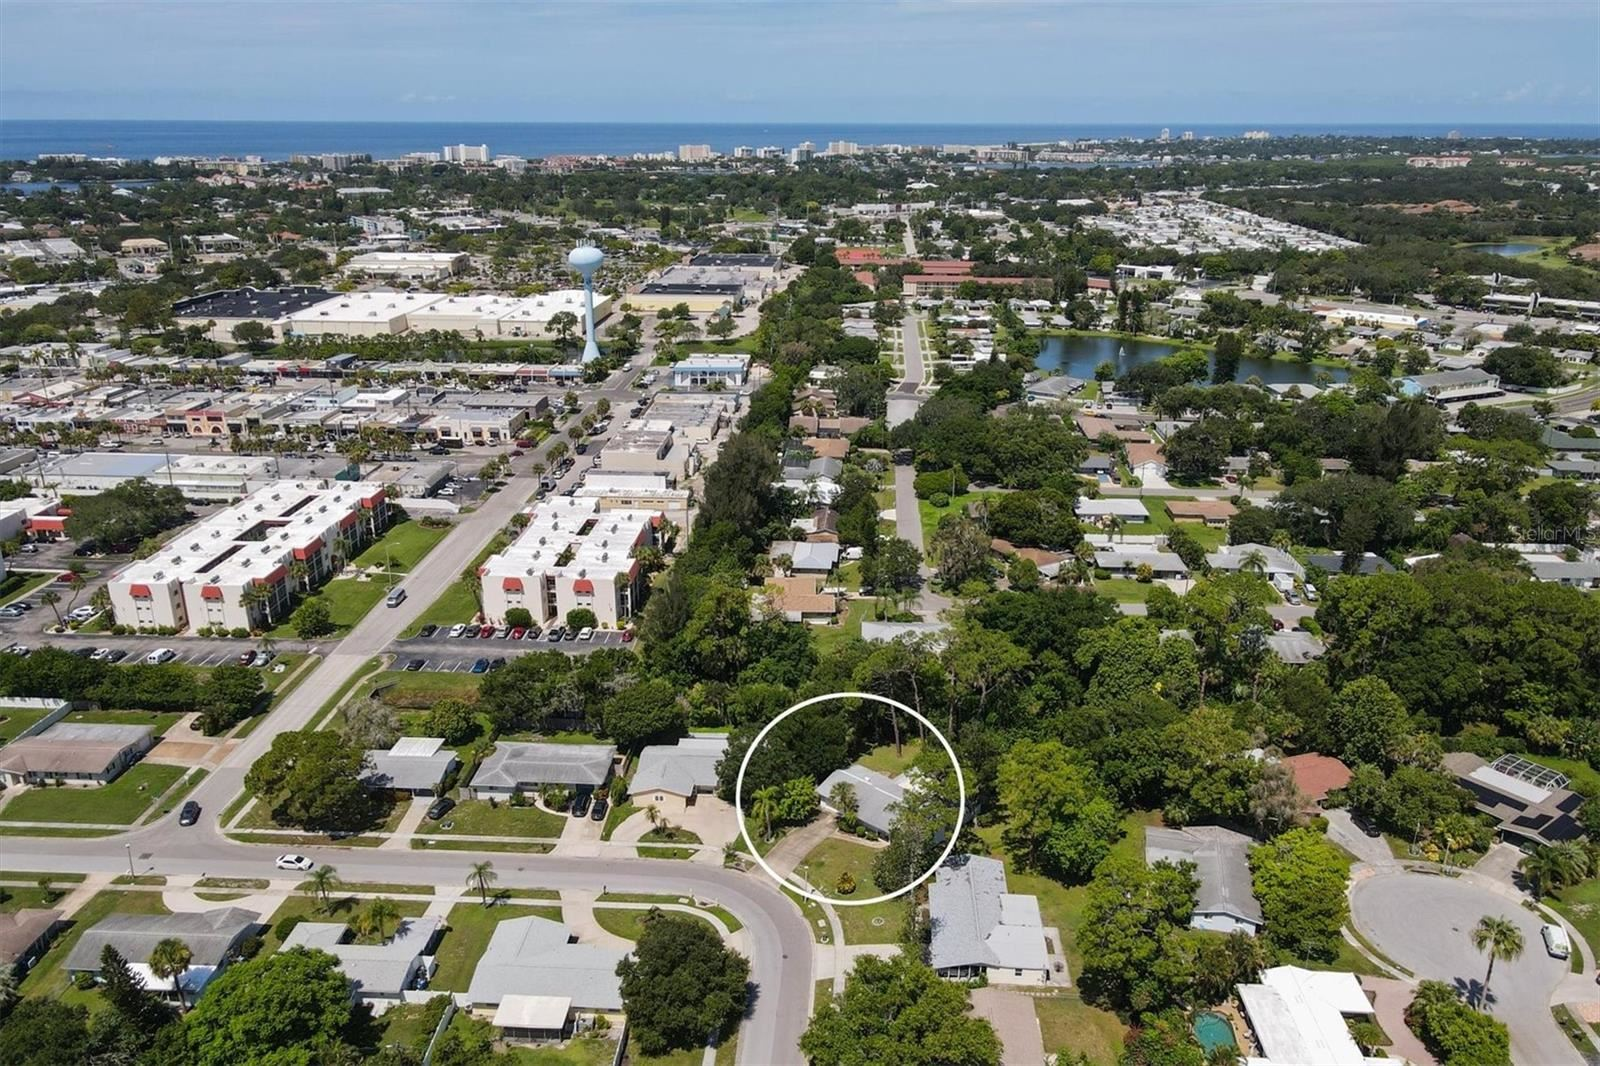 Photo of 6434 COLONIAL DRIVE, SARASOTA, FL 34231 (MLS # N6116868)